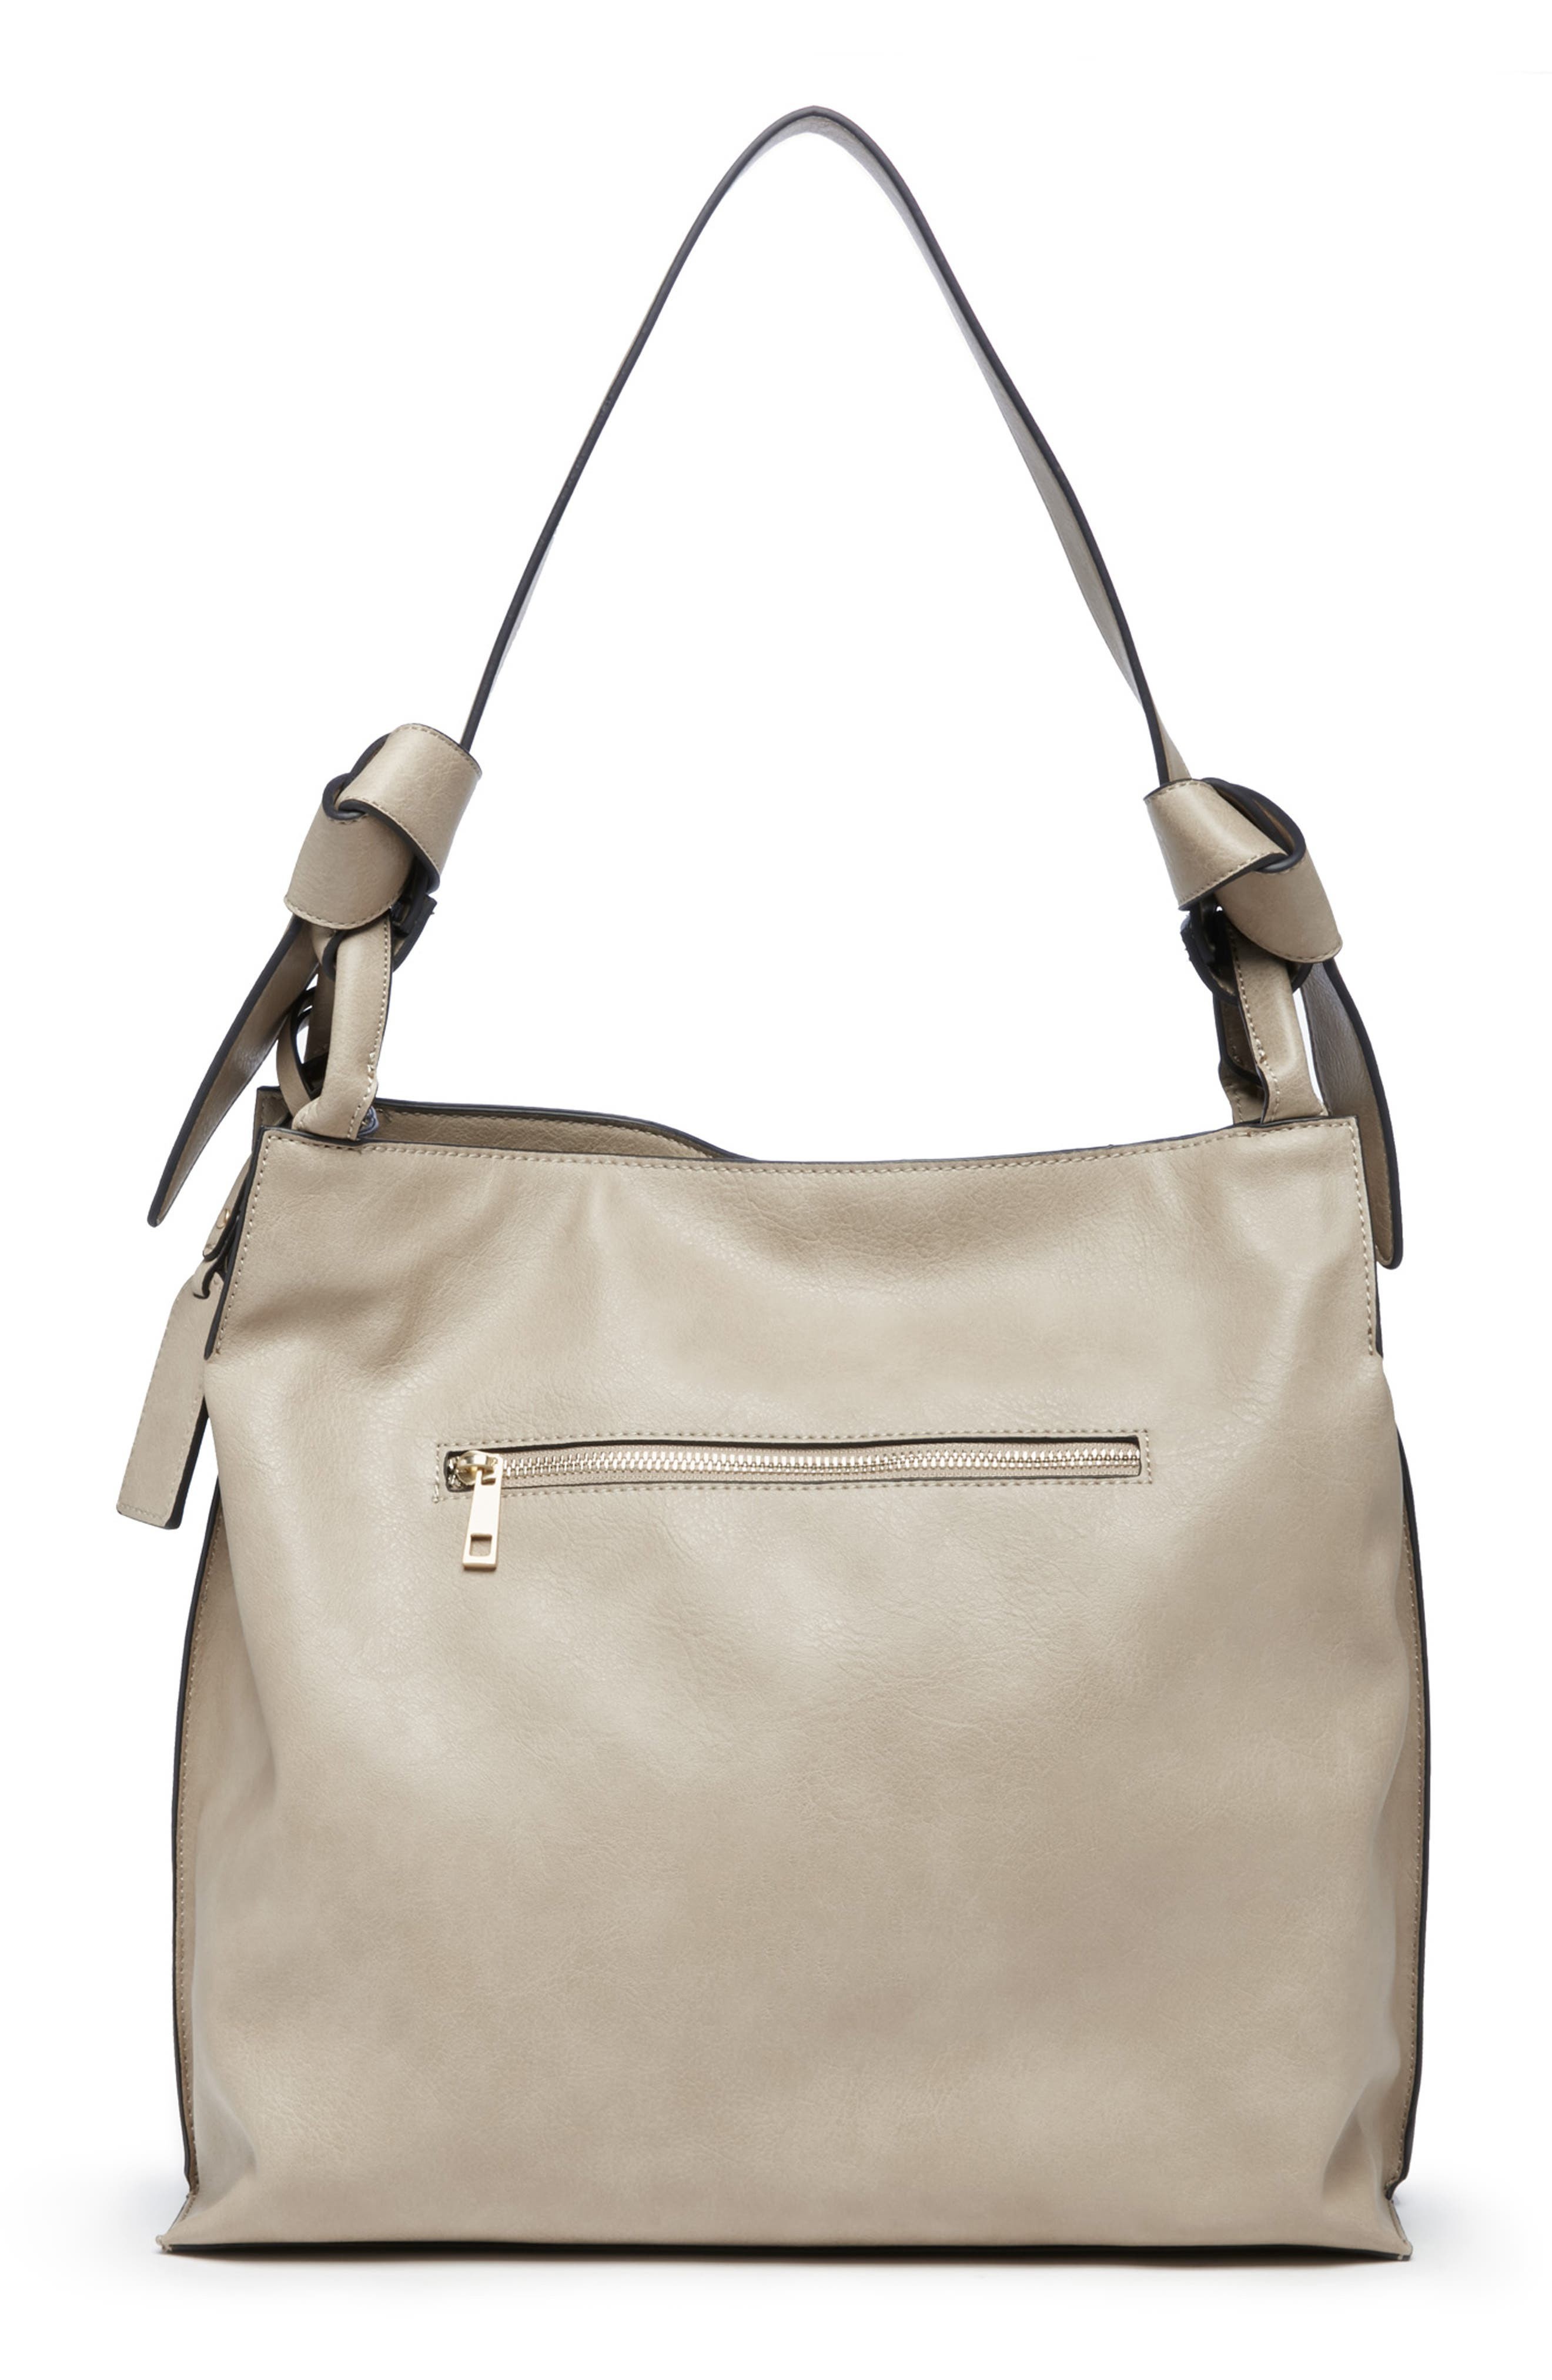 Josah Faux Leather Shoulder Bag,                             Alternate thumbnail 9, color,                             SAFARI